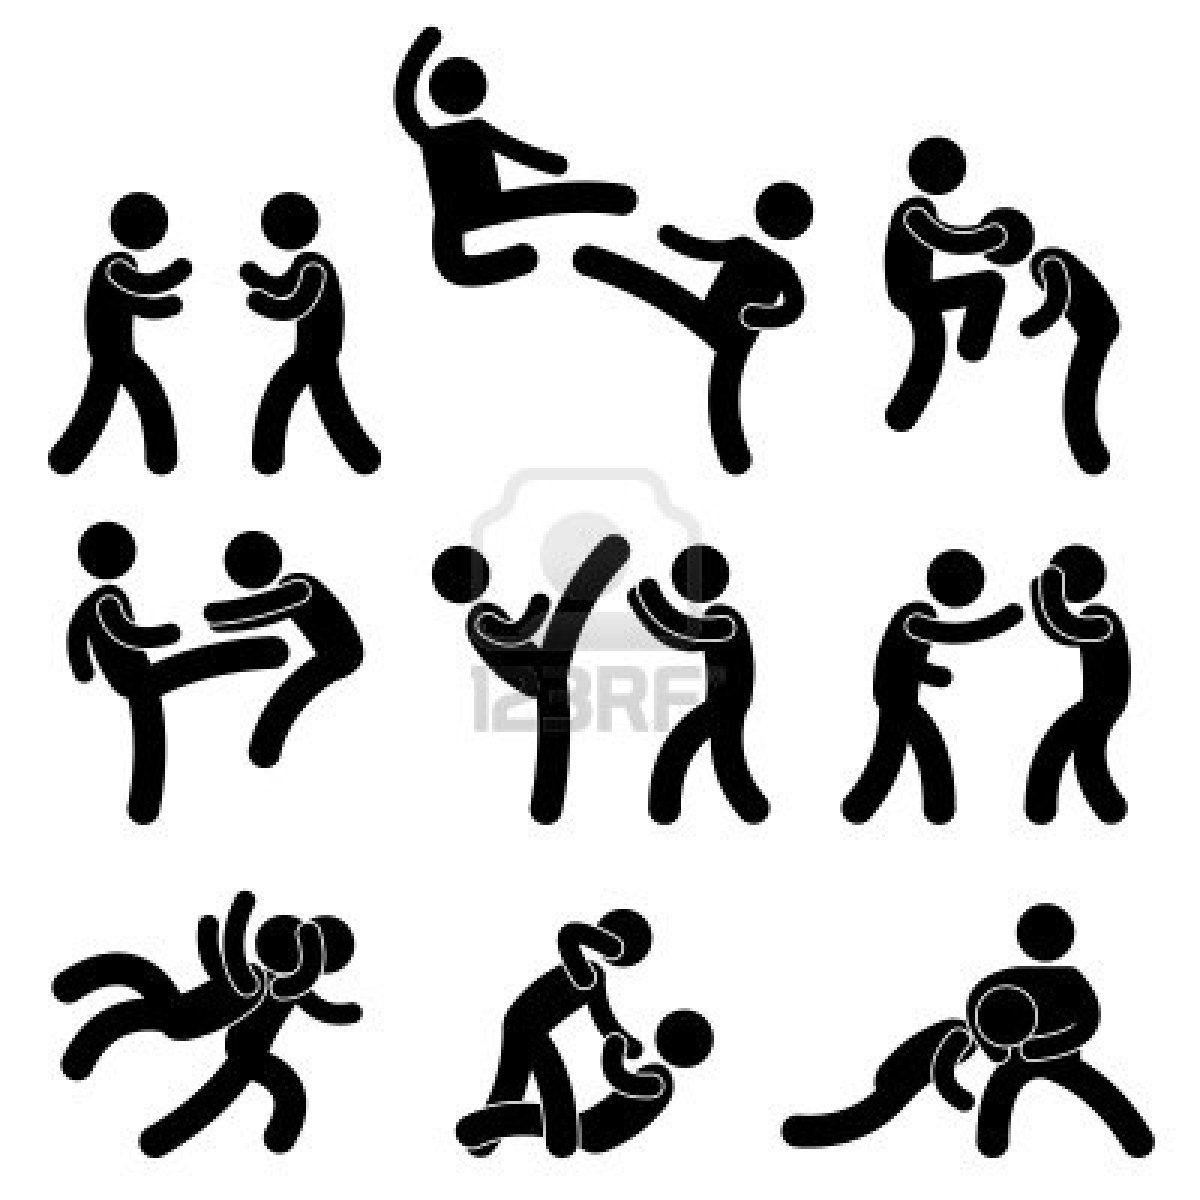 11102674 Fight Fighter Muay Thai Boxing Karate Taekwondo Wrestling Kick Punch Grab Throw People Jpg 1200 Stick Figure Fighting Muay Thai Stick Figure Drawing